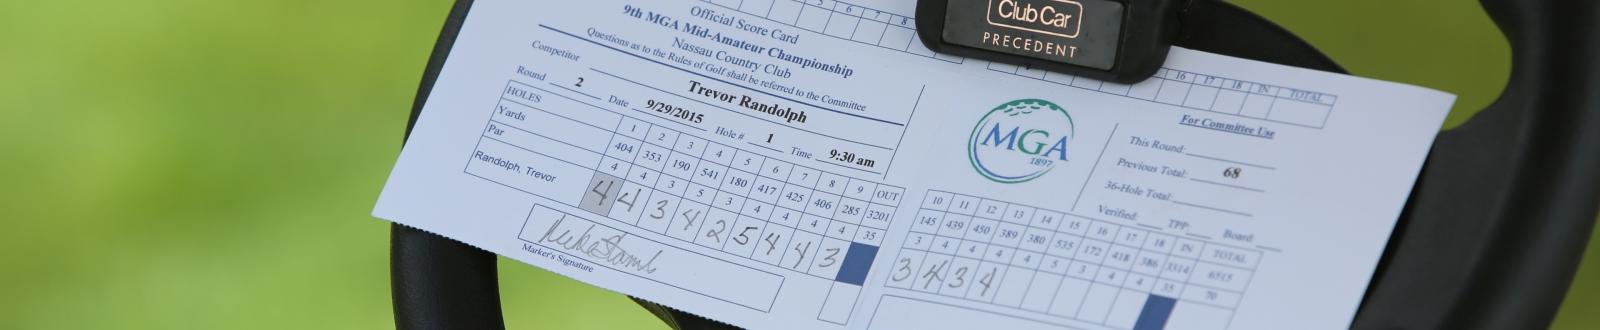 A scorecard on a golf cart steering wheel